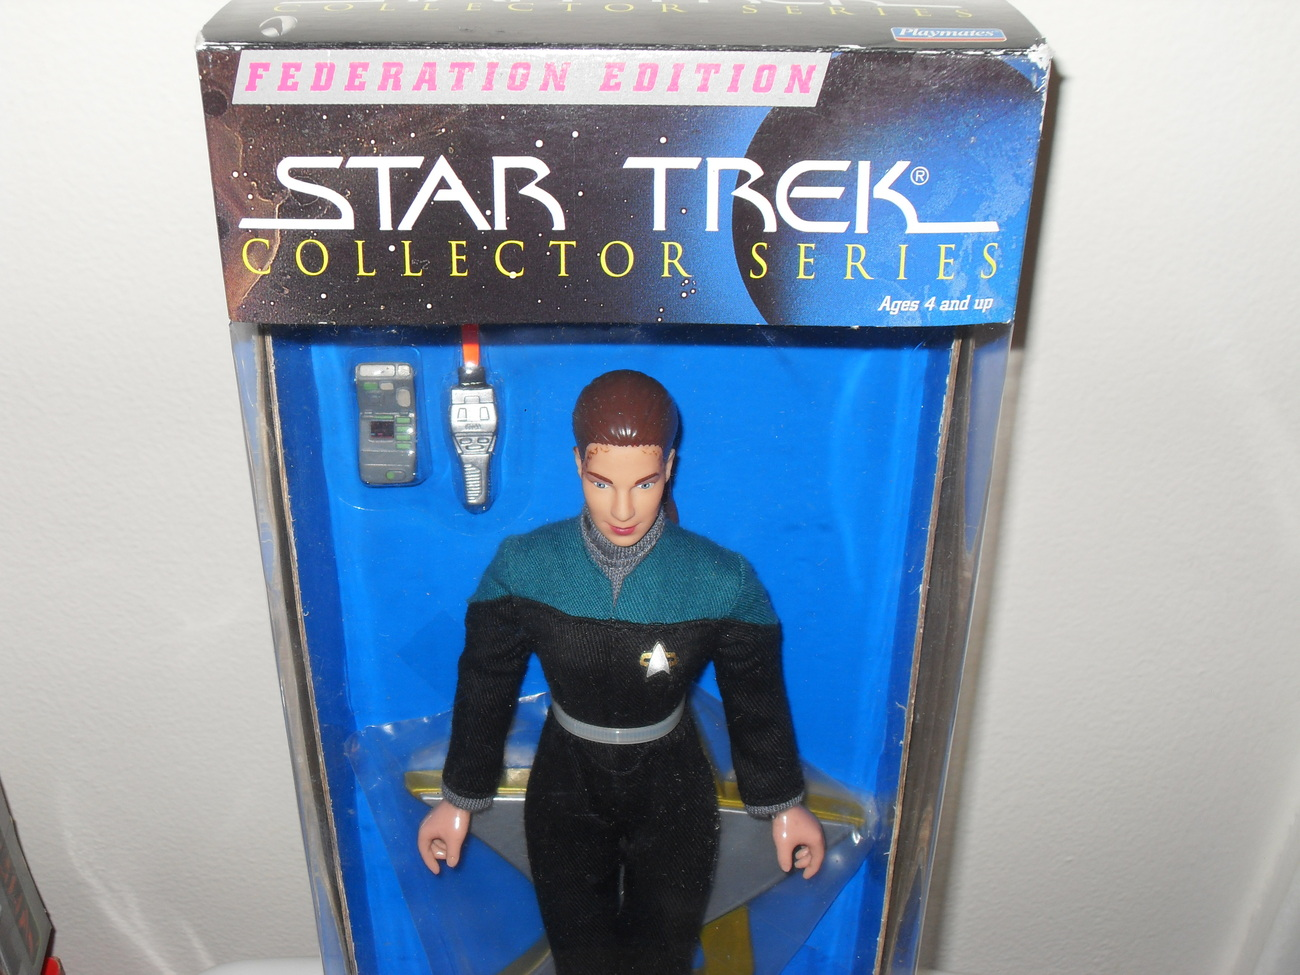 1997 Star Trek Jadzia Dax In Box    Collector series Edition